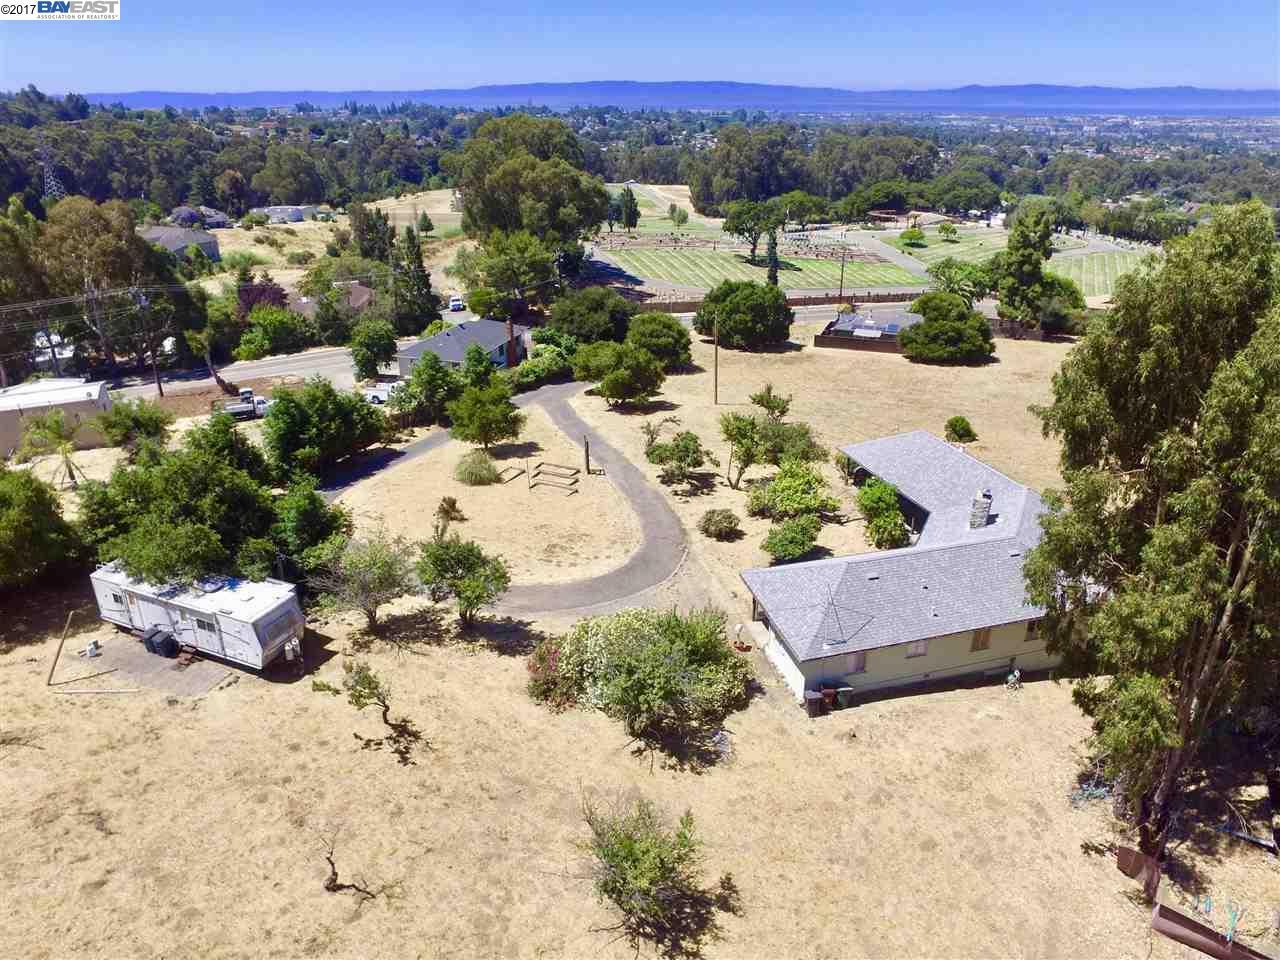 土地 為 出售 在 24694 Fairview Avenue 24694 Fairview Avenue Hayward, 加利福尼亞州 94542 美國